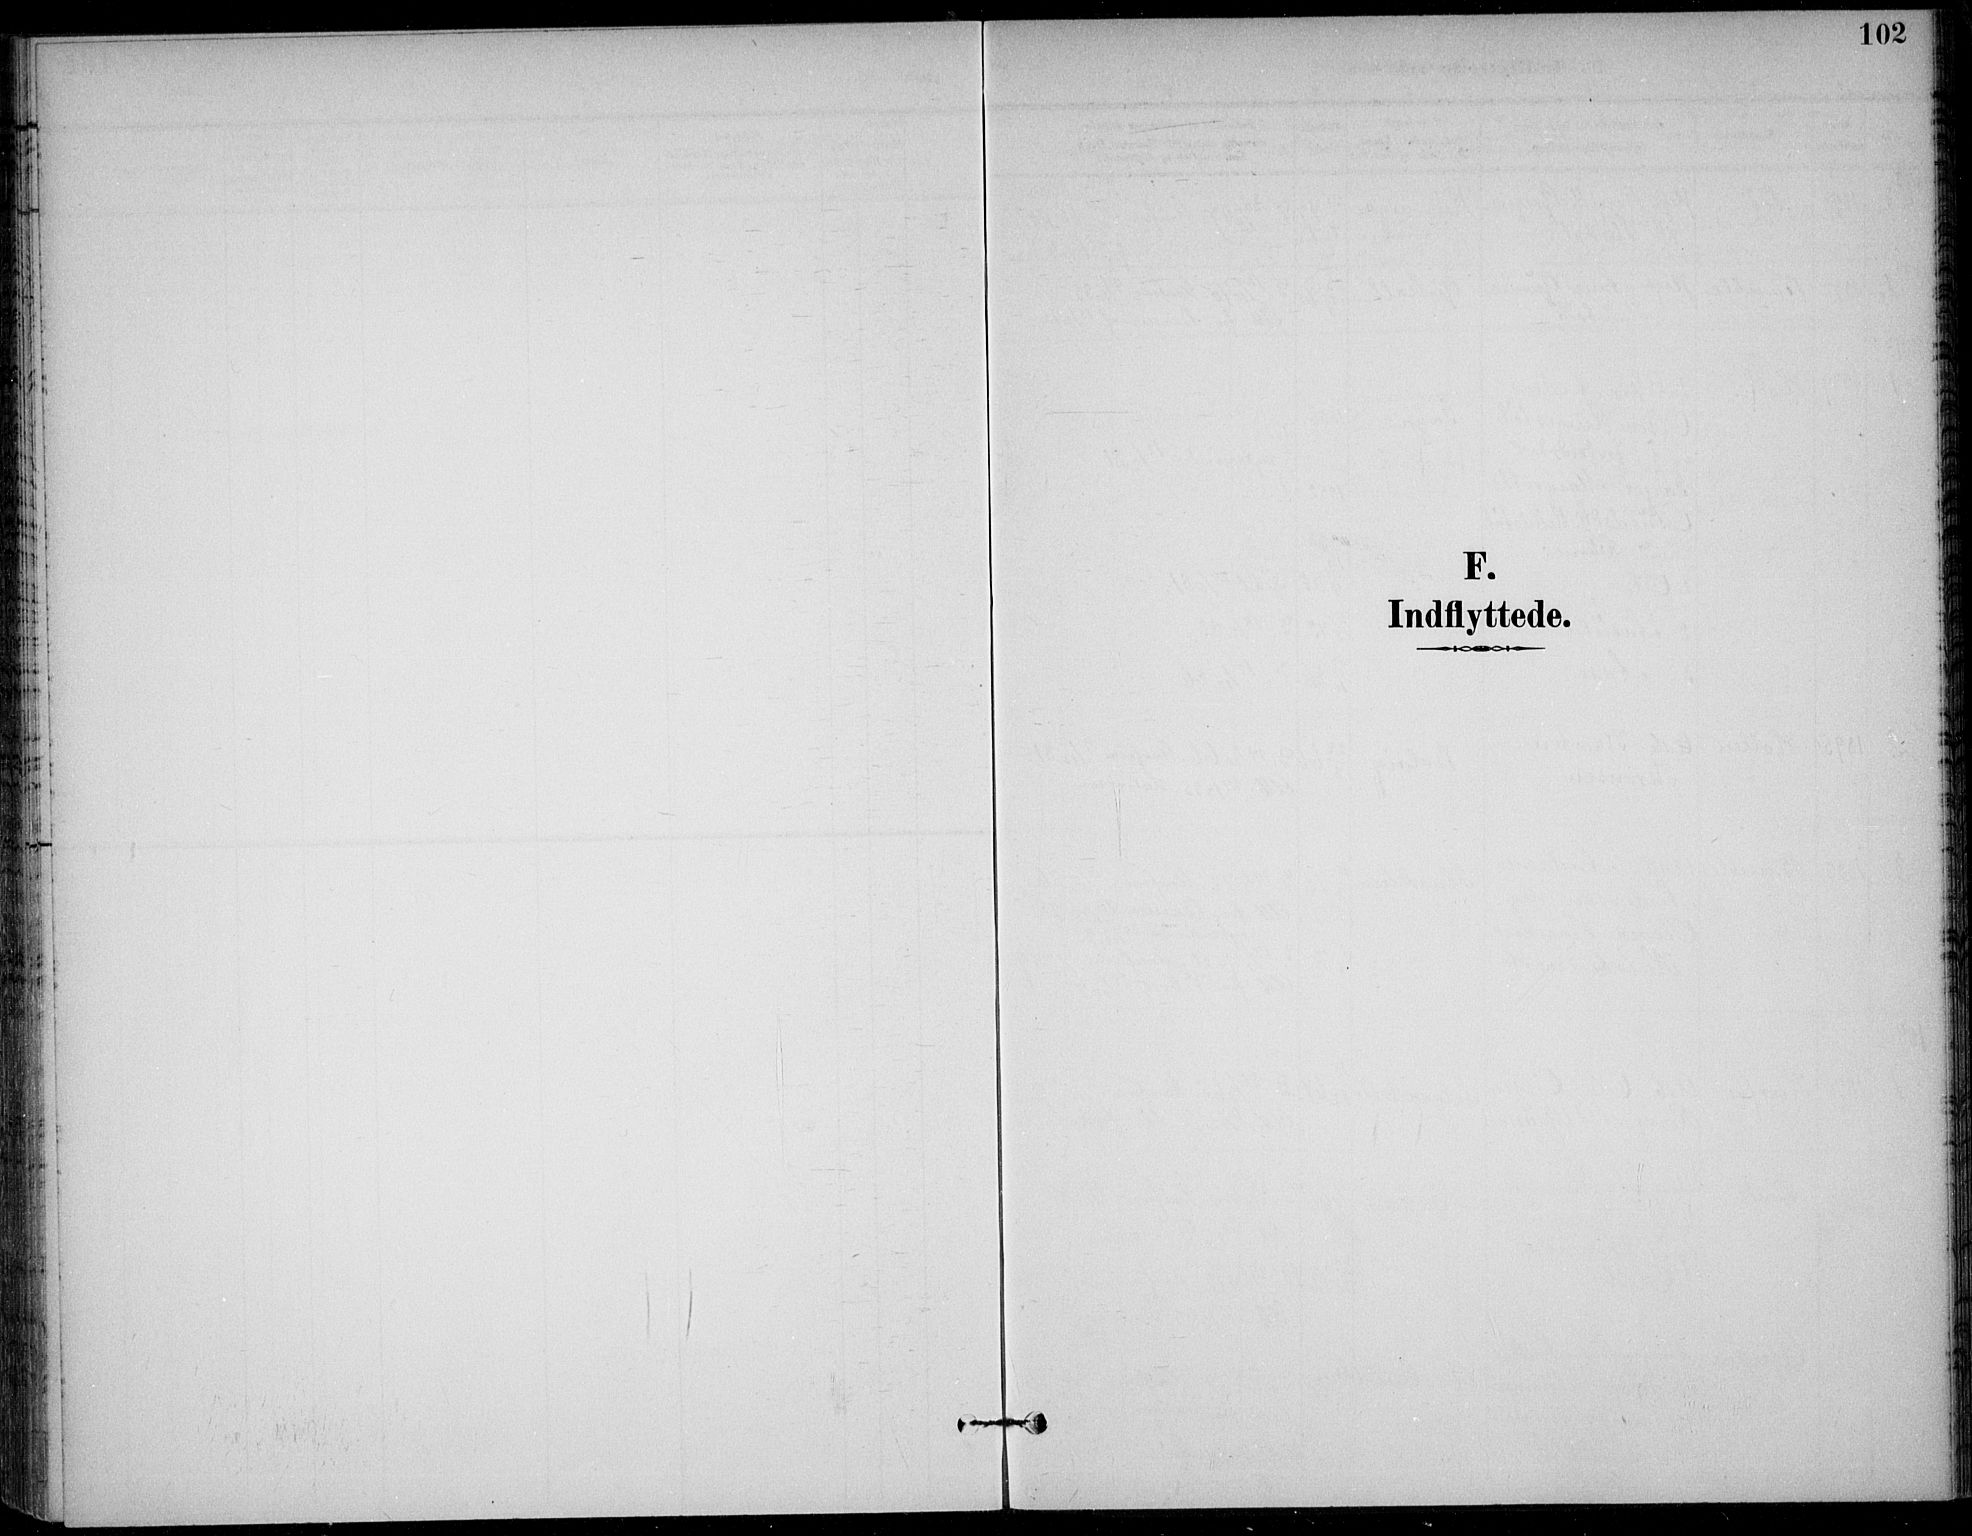 SAKO, Solum kirkebøker, F/Fc/L0002: Ministerialbok nr. III 2, 1892-1906, s. 102